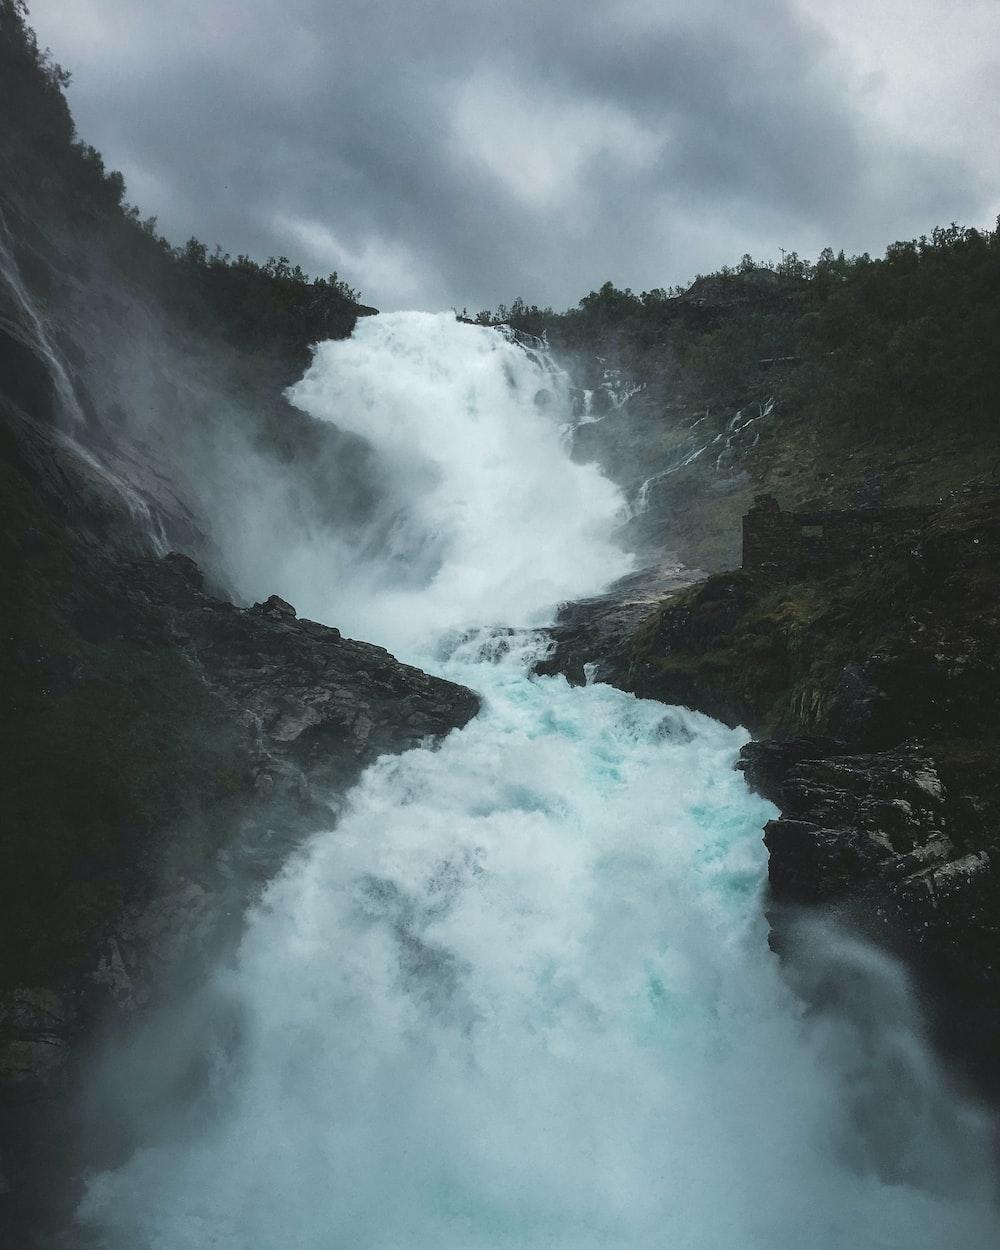 waterfalls under grey sky